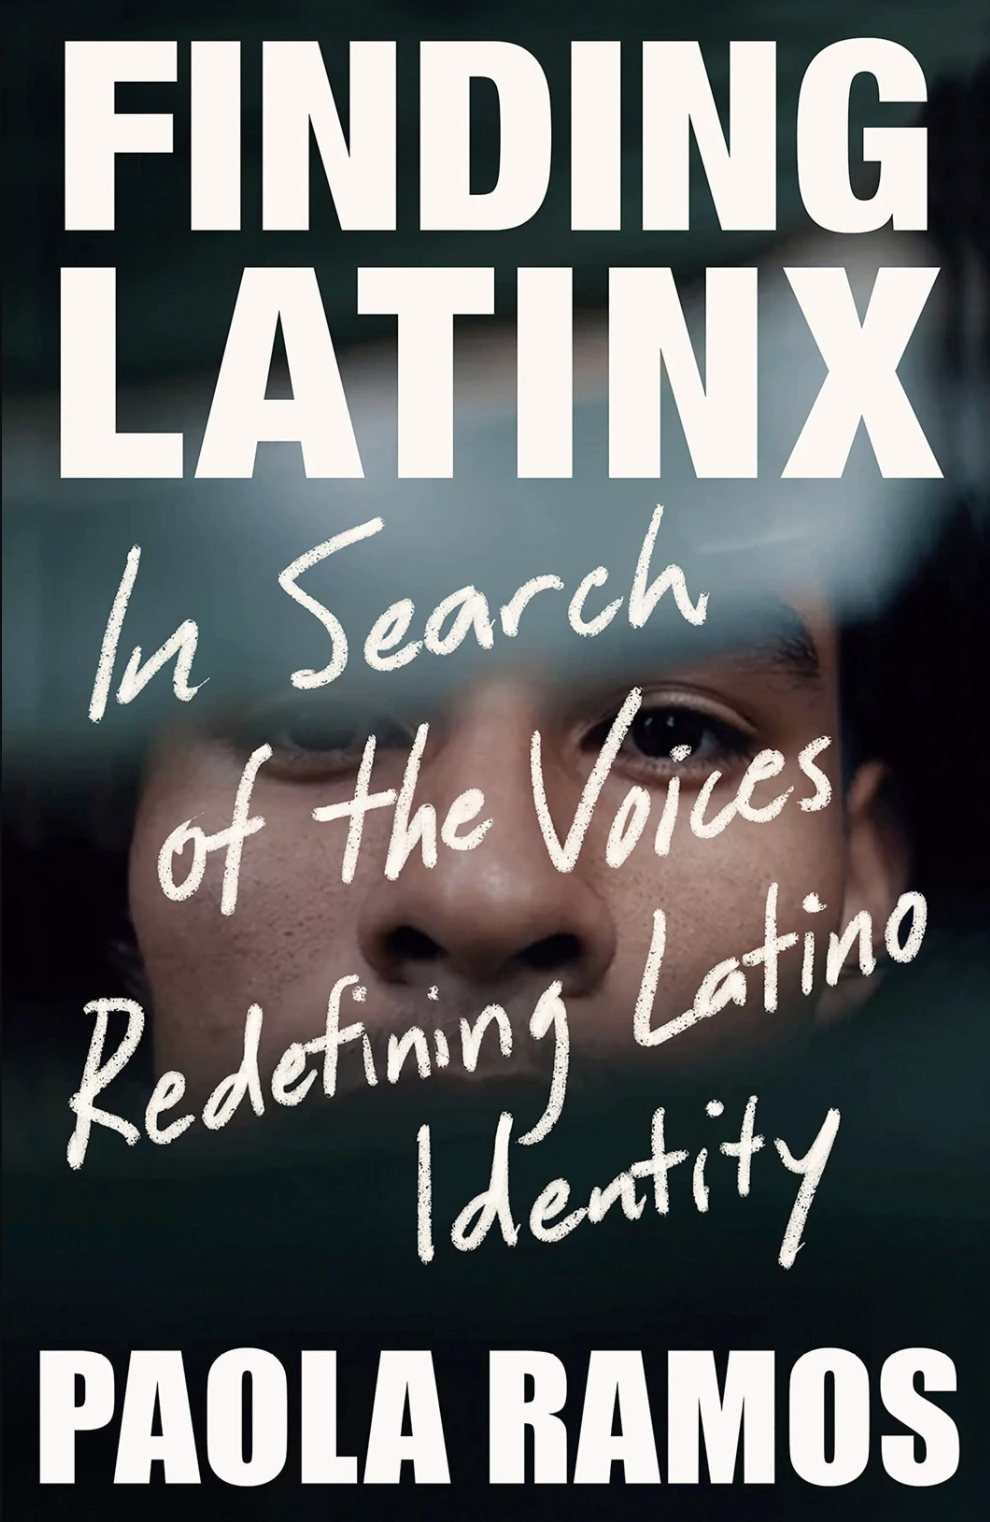 Paola Ramos - Finding Latinx